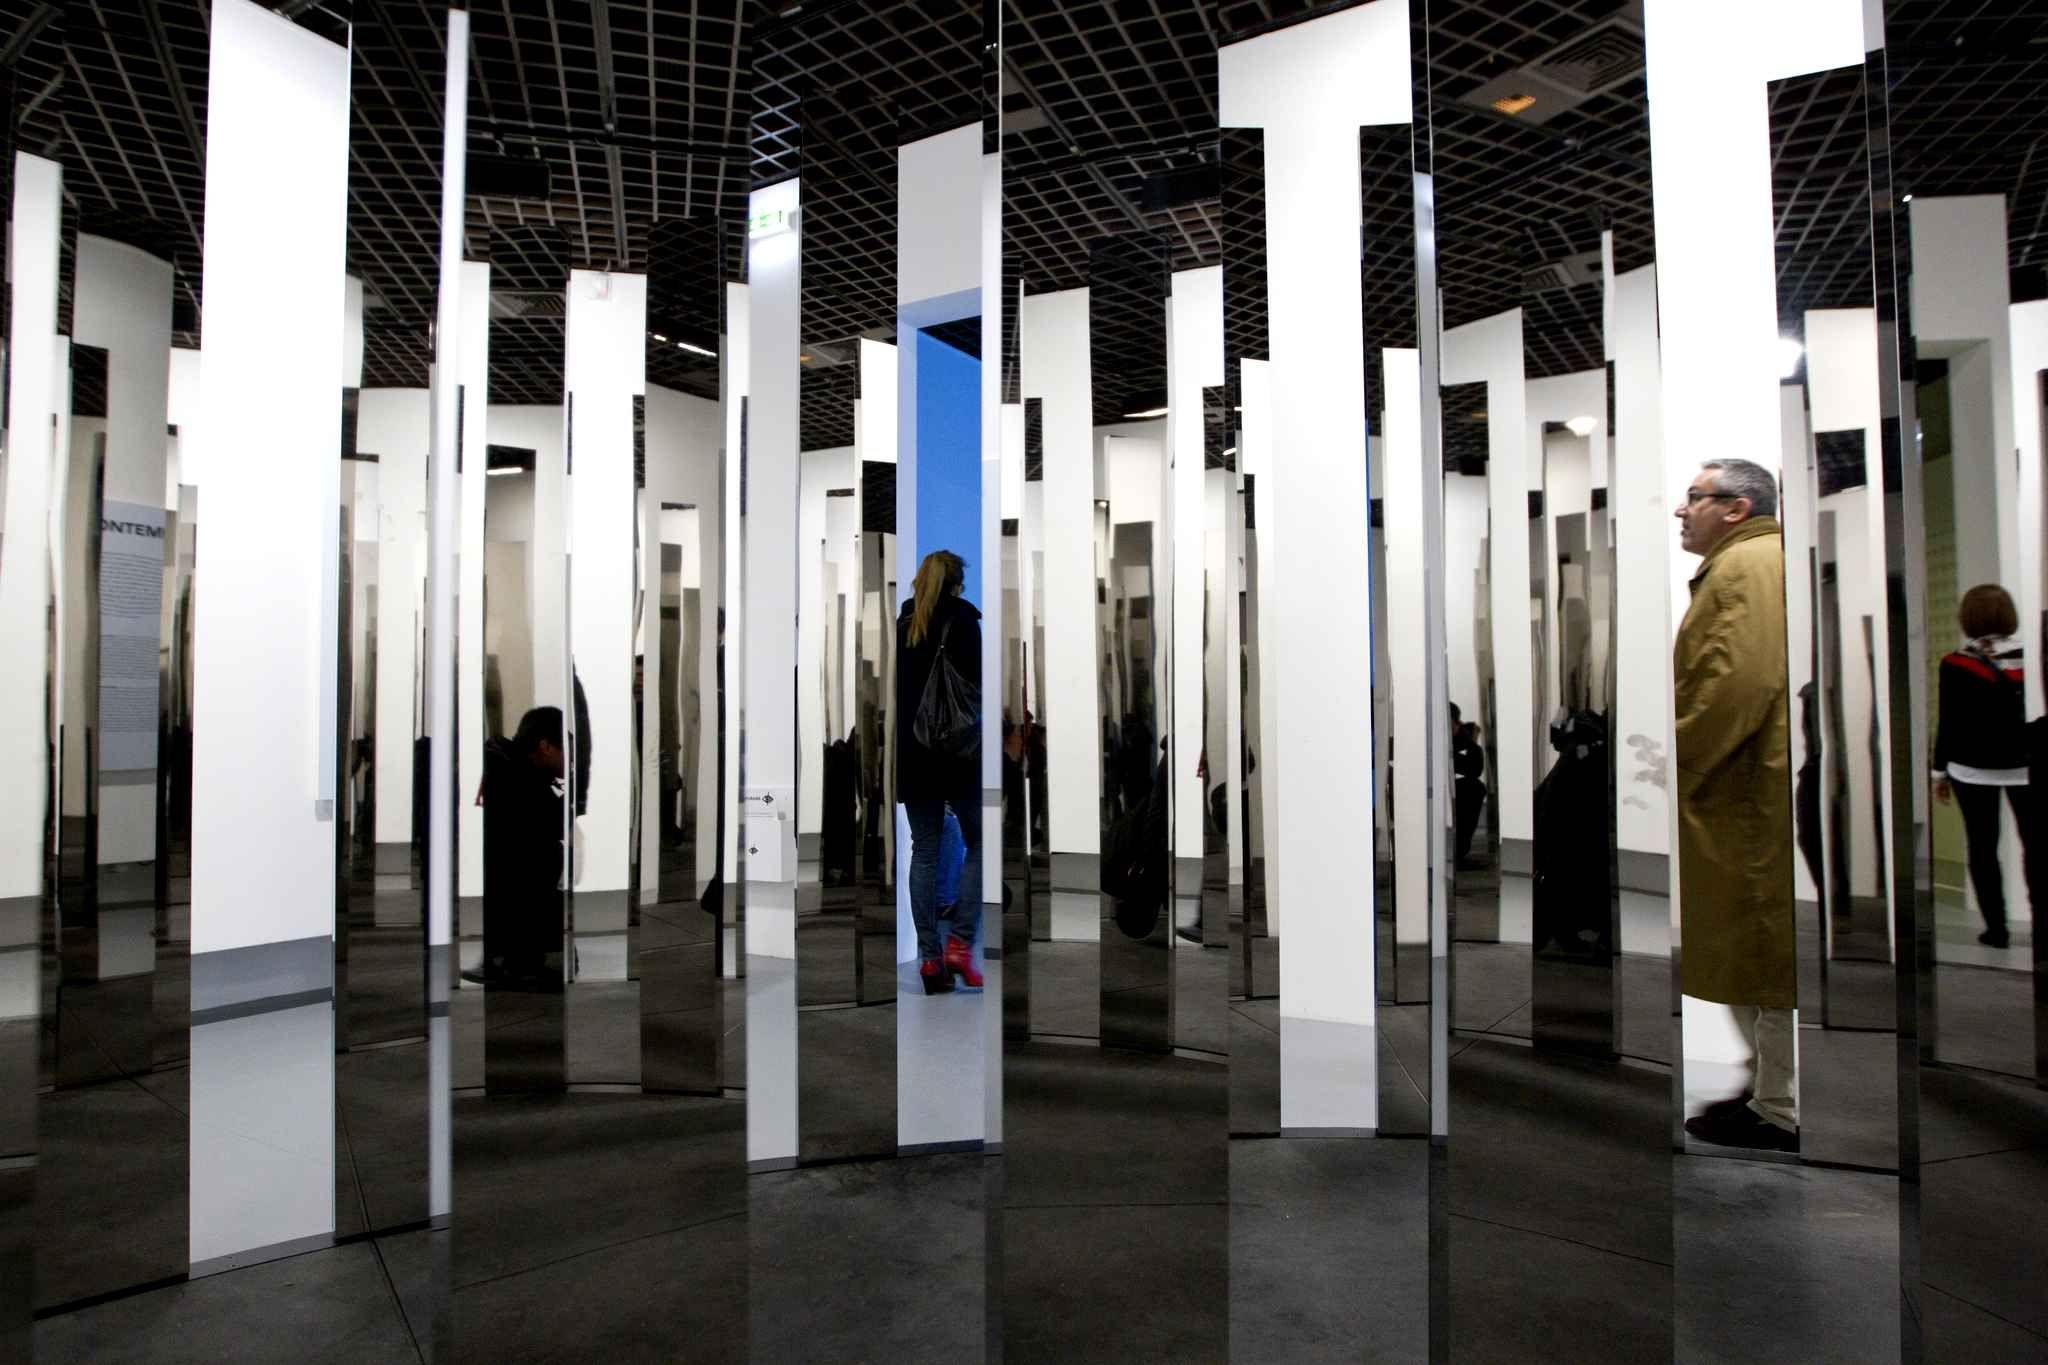 Jeppe Hein, Rotating Labyrinth (2007).